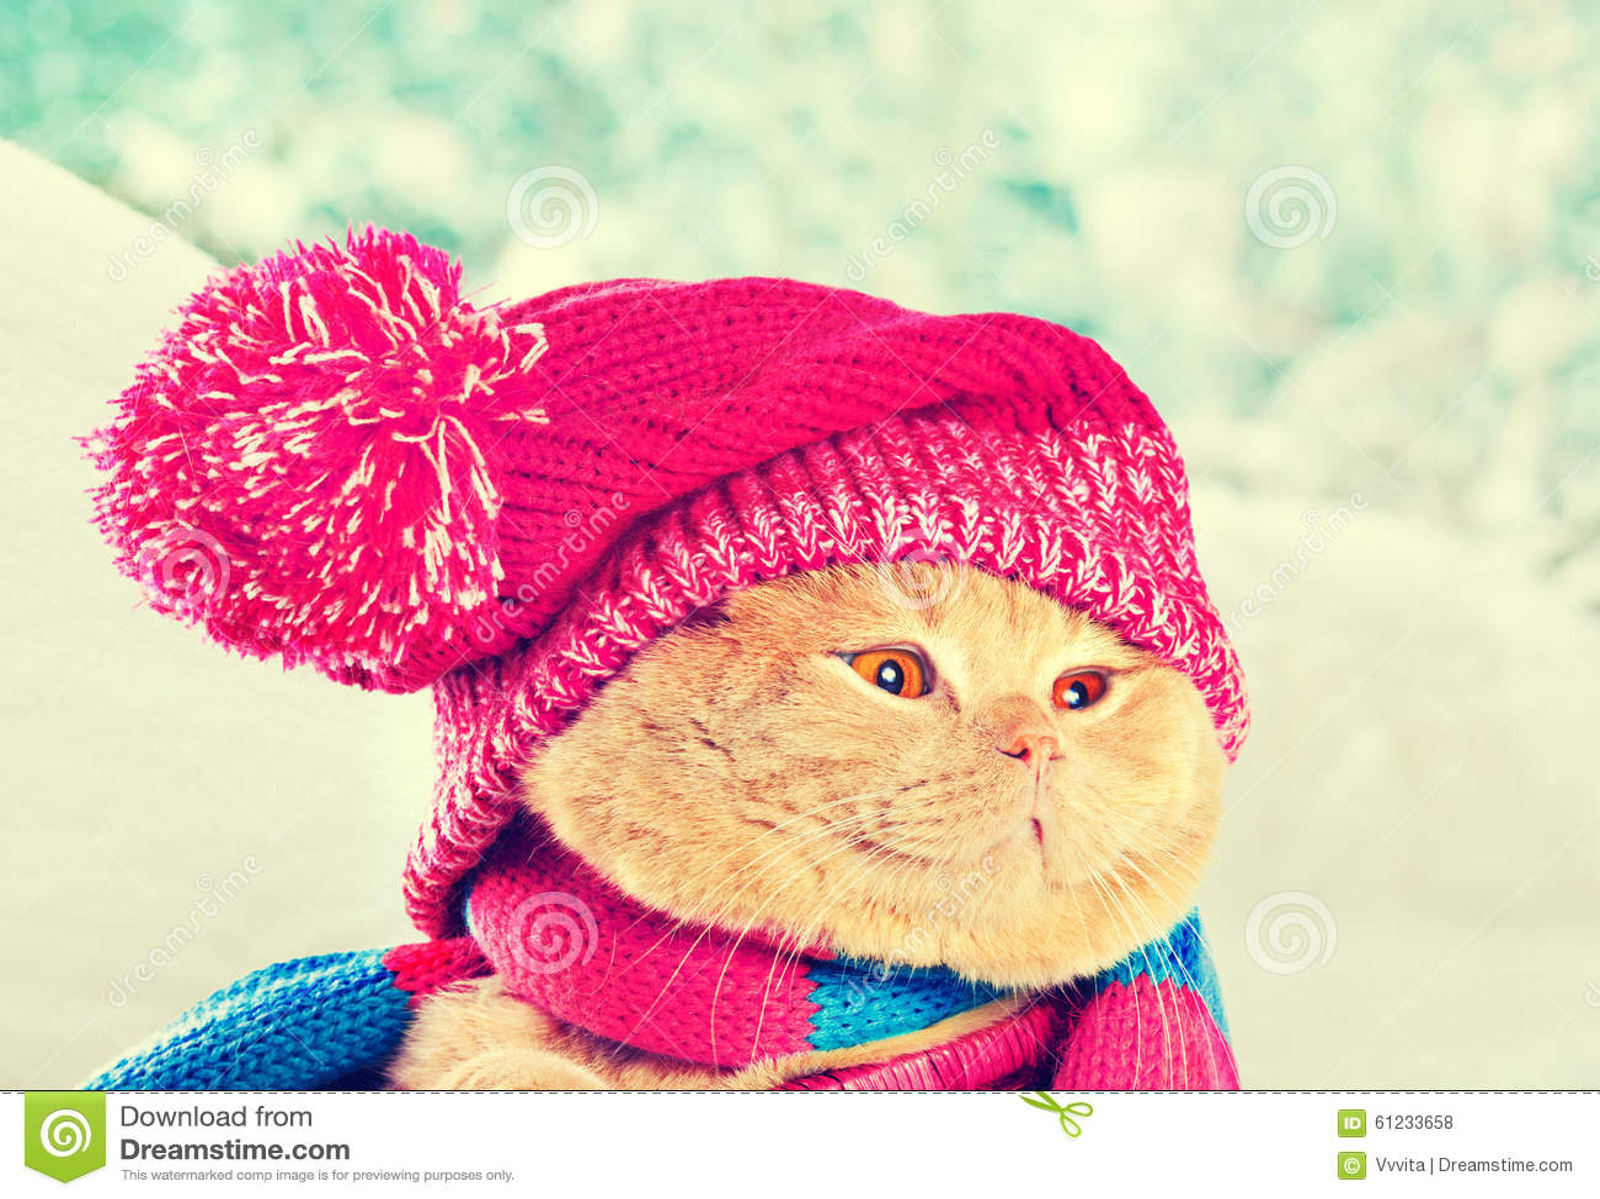 b228fc2e Cat wearing knitting hat stock photo. Image of animals - 61233658